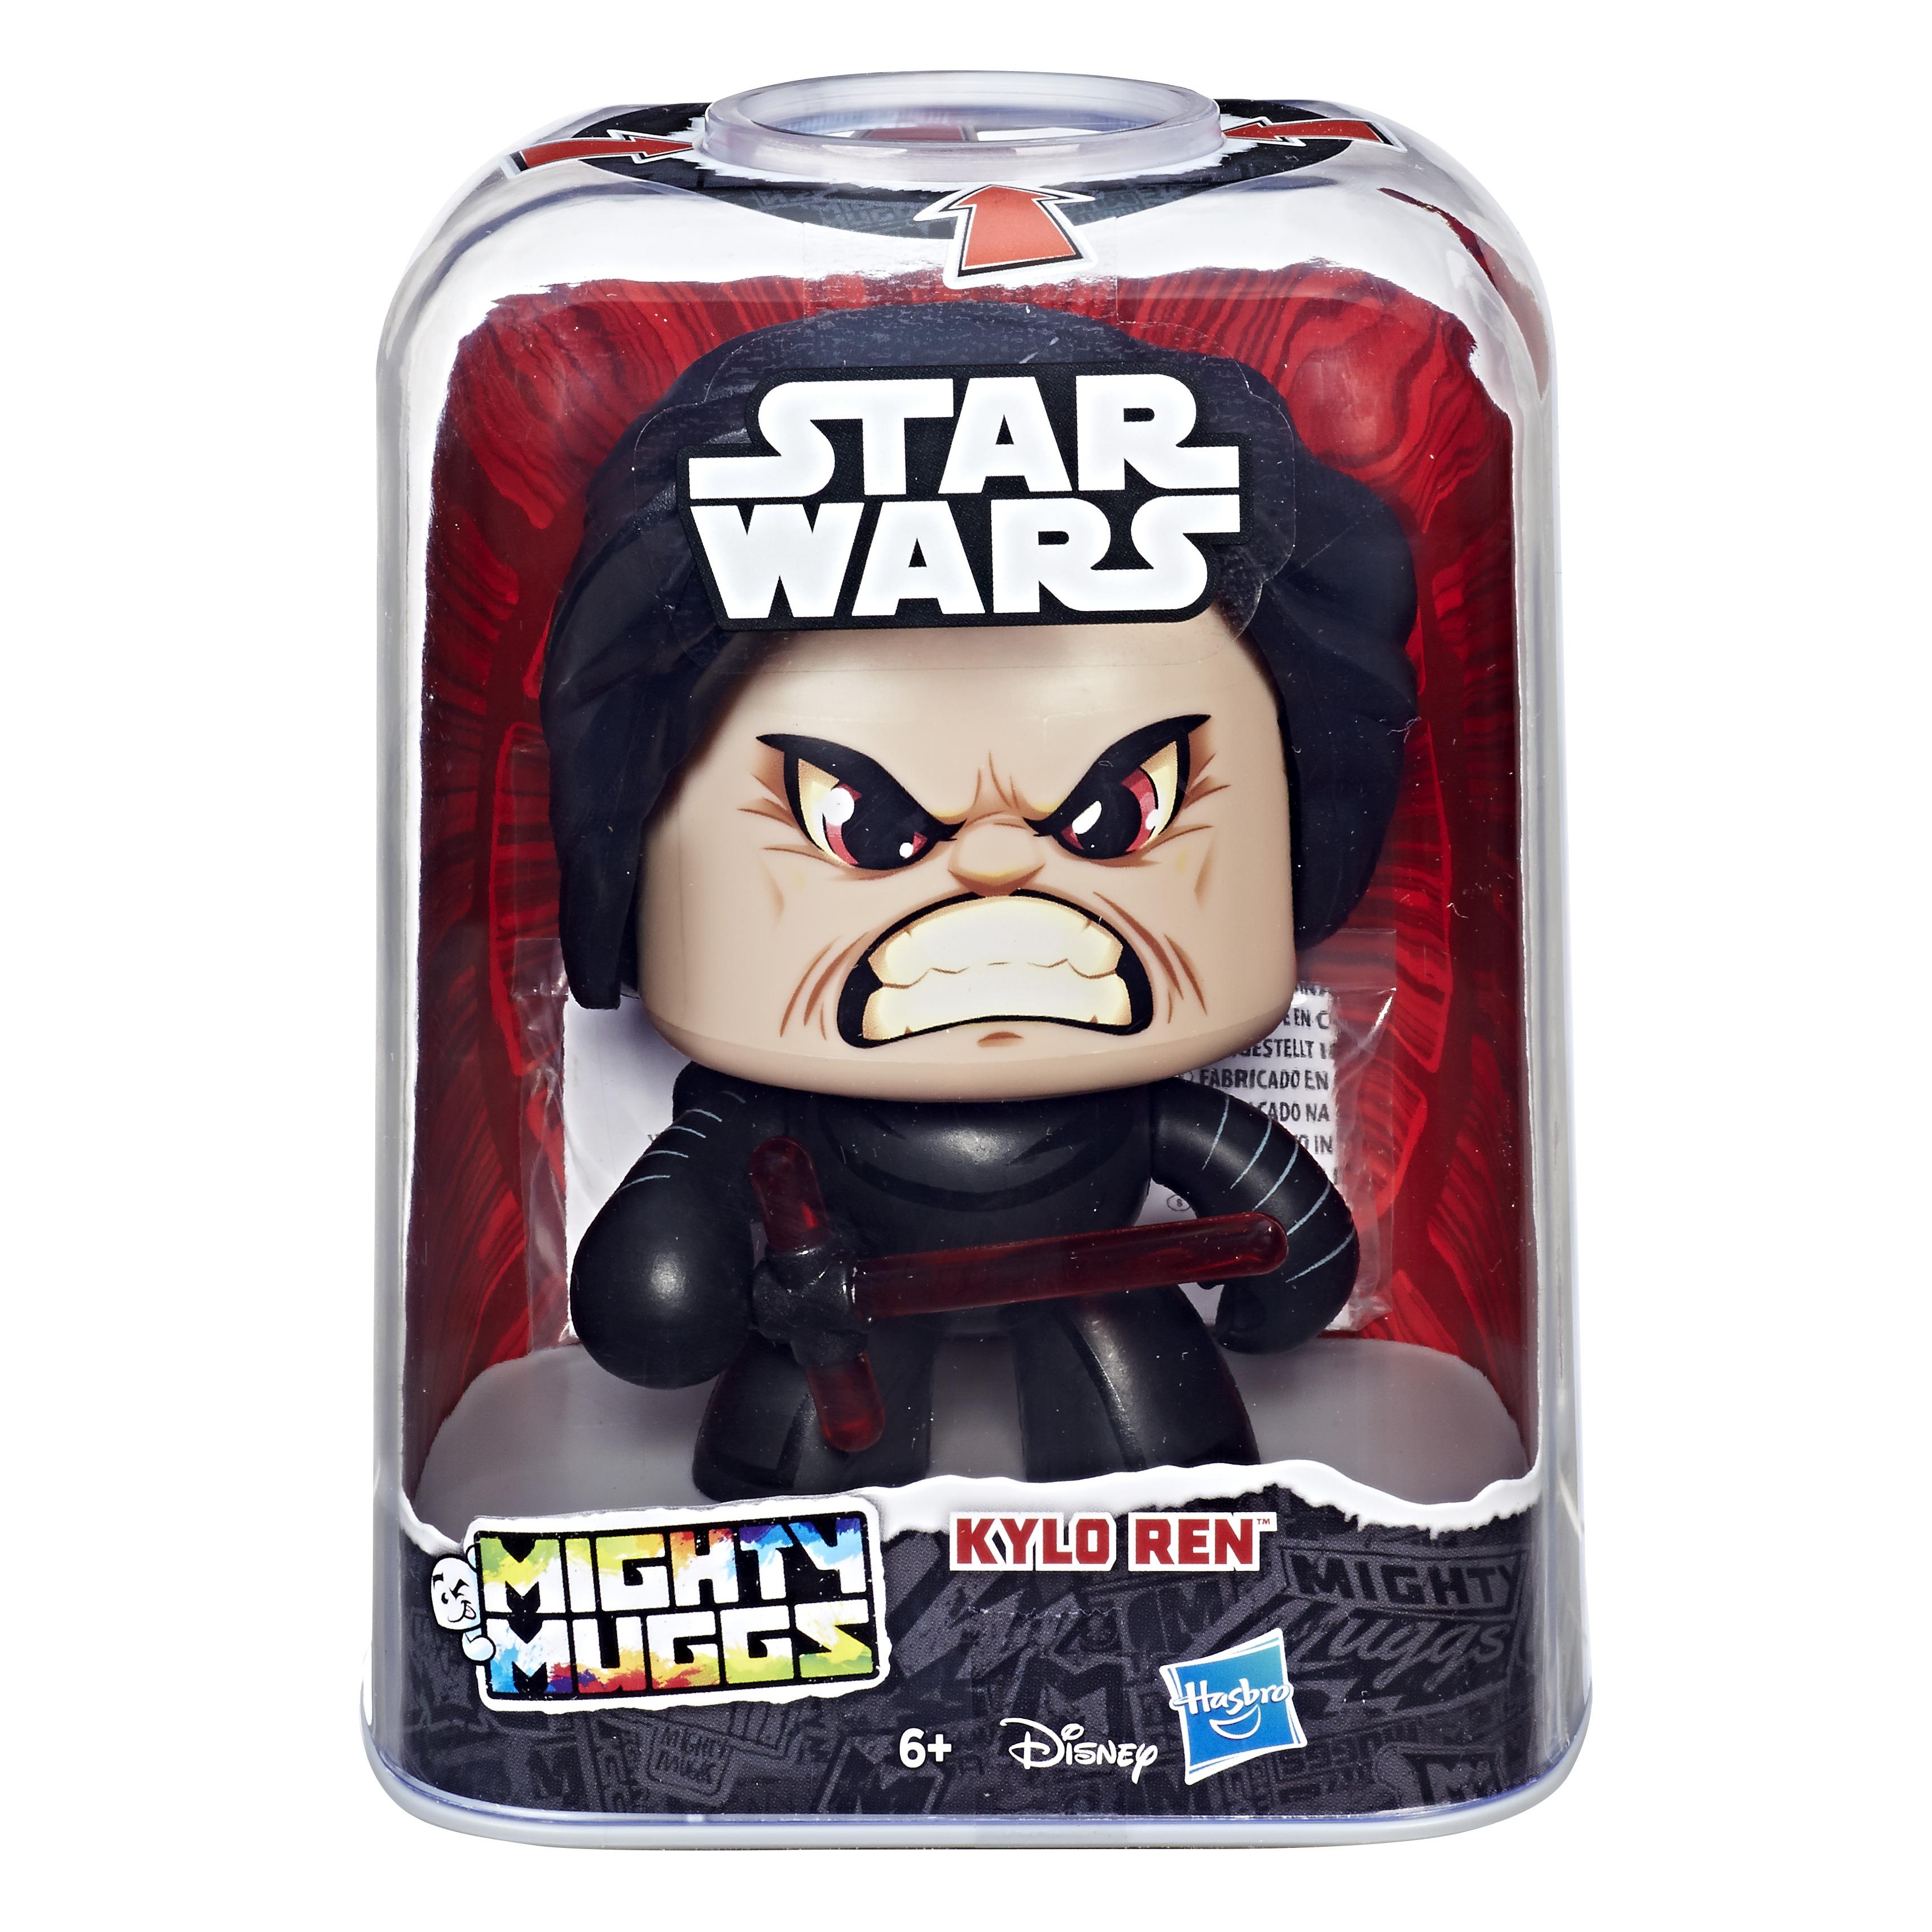 Mighty Muggs. Star Wars - Kylo Ren